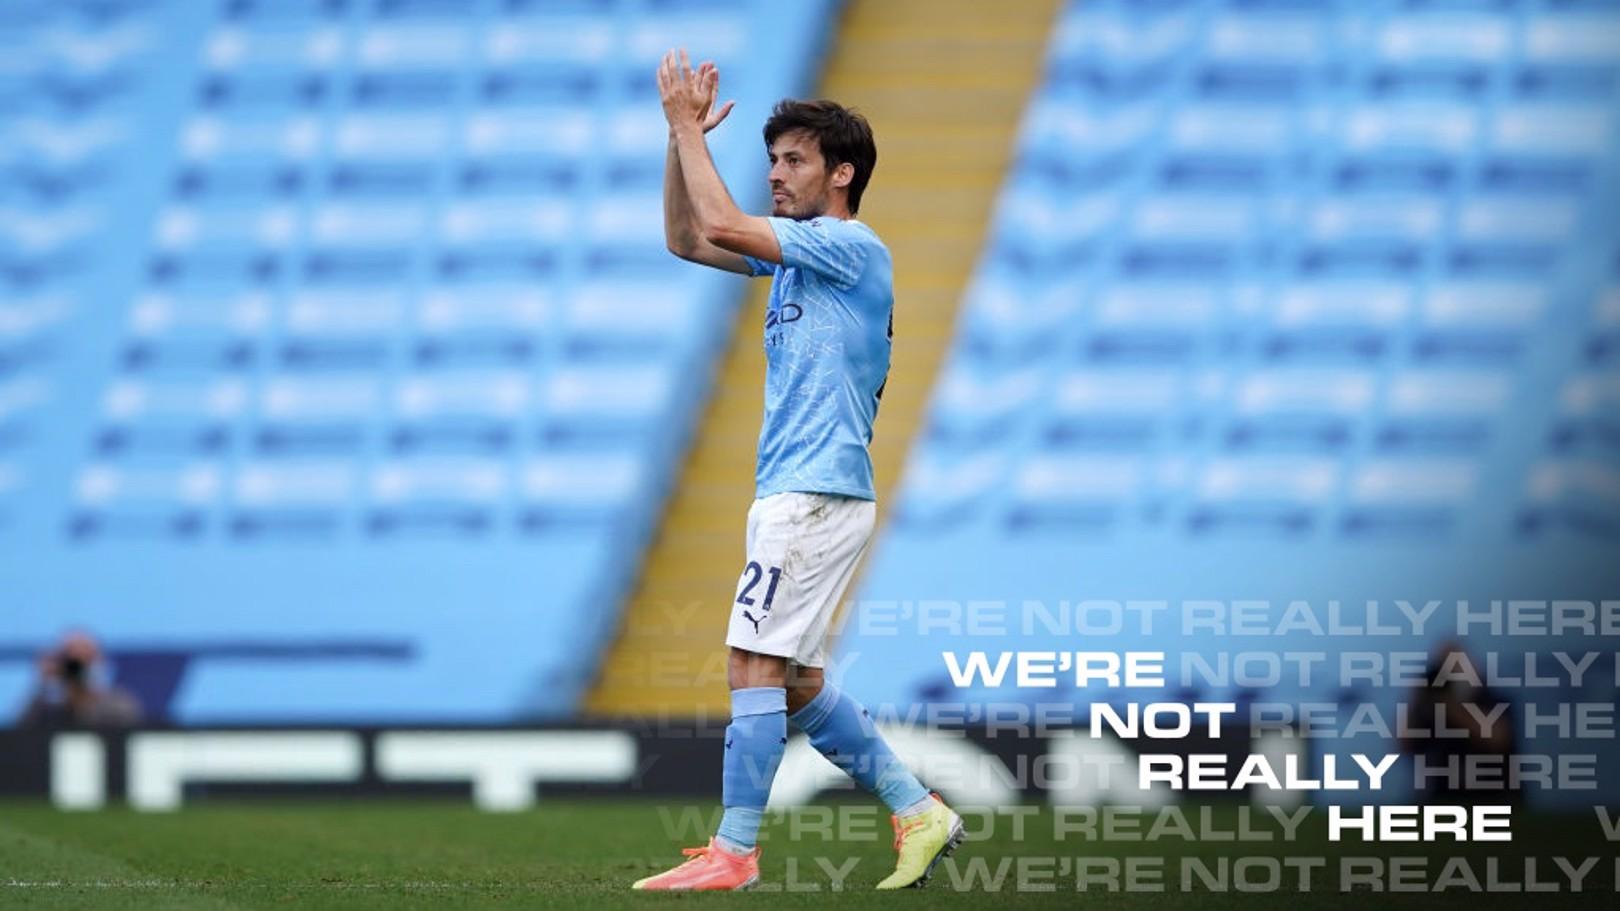 David Silva shares pride at City career